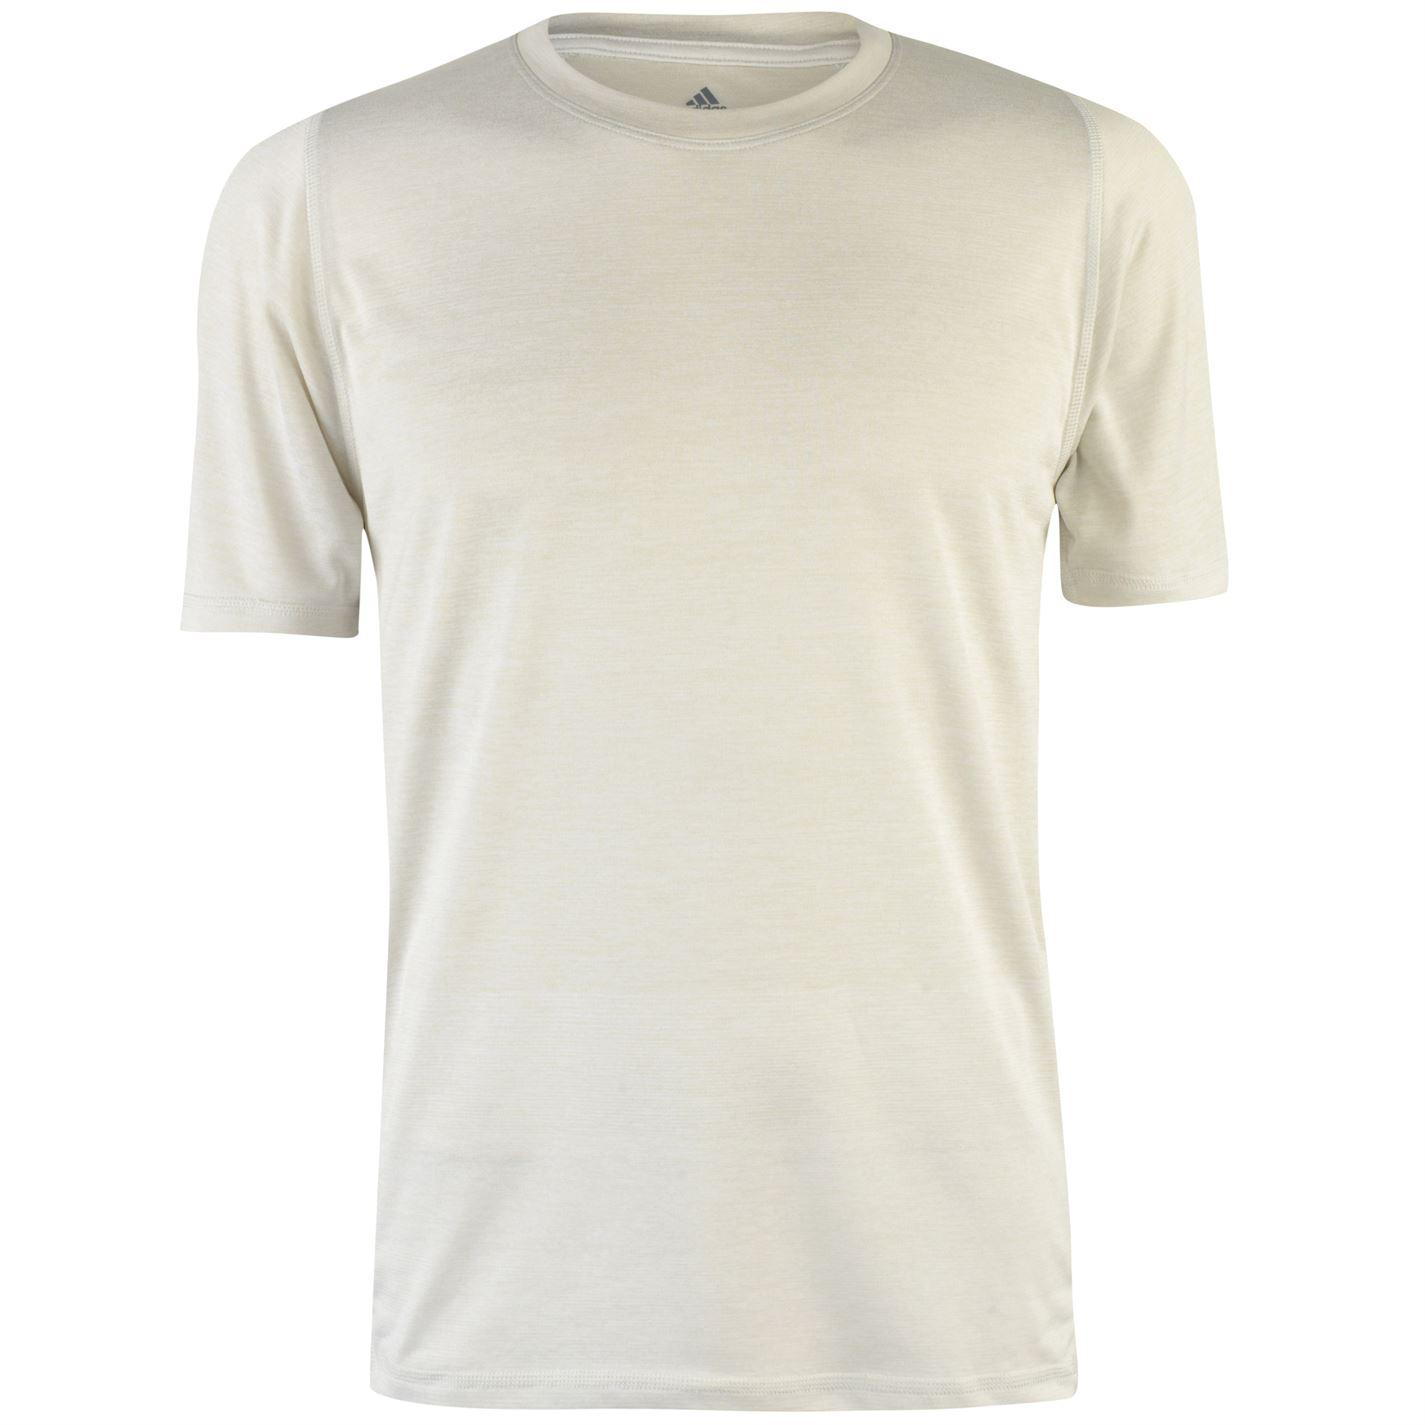 Adidas Mens Freelift Grad T-Shirt